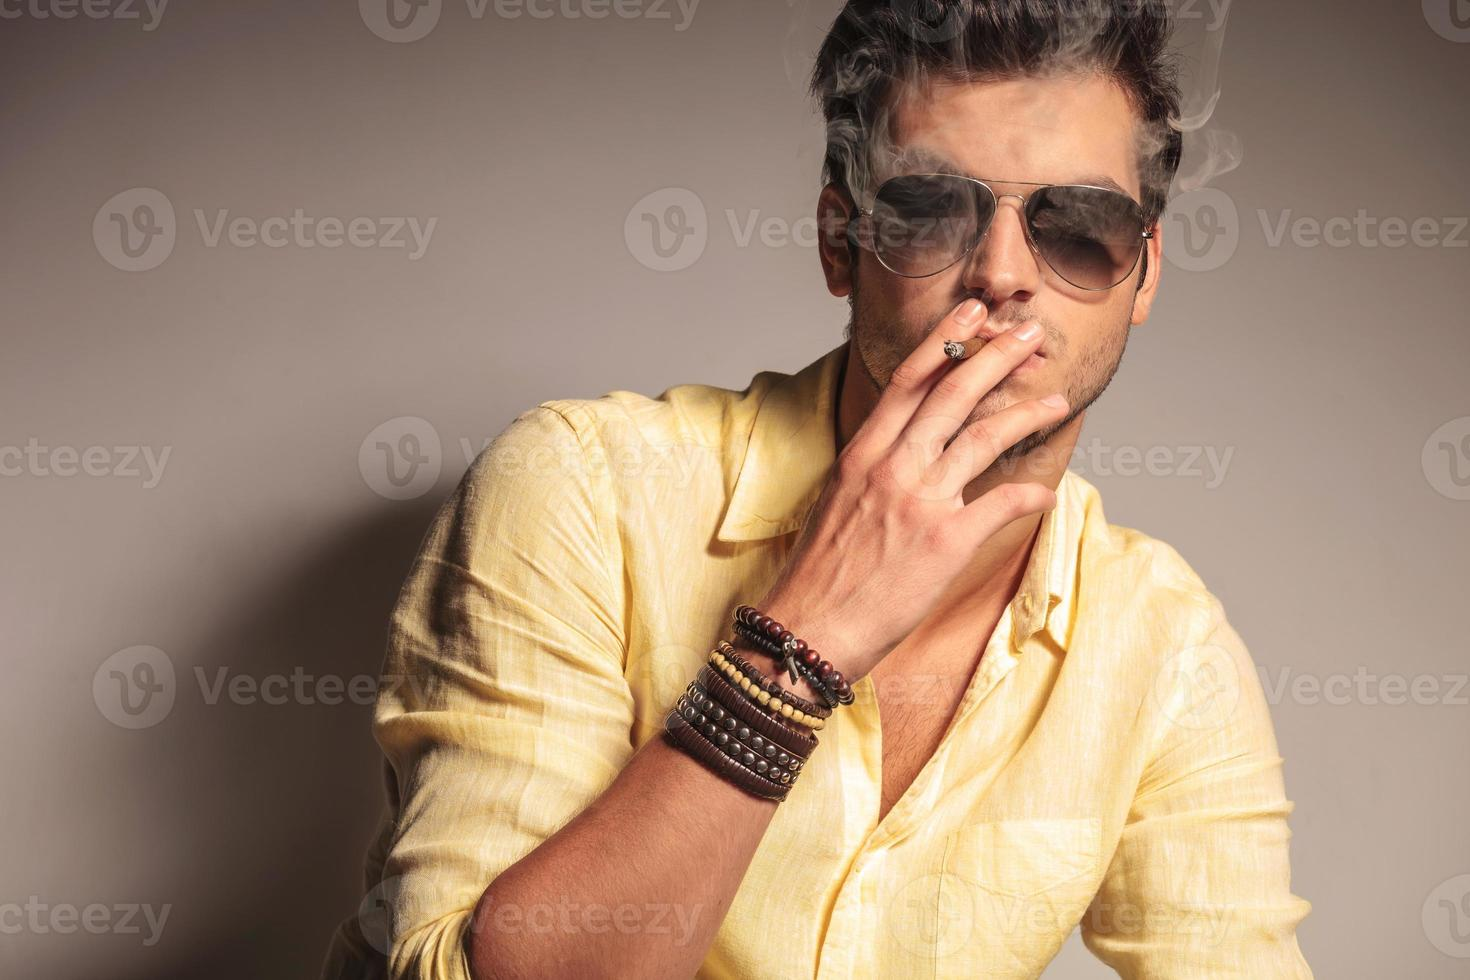 homem legal moda com óculos de sol, desfrutando de seu cigarro foto